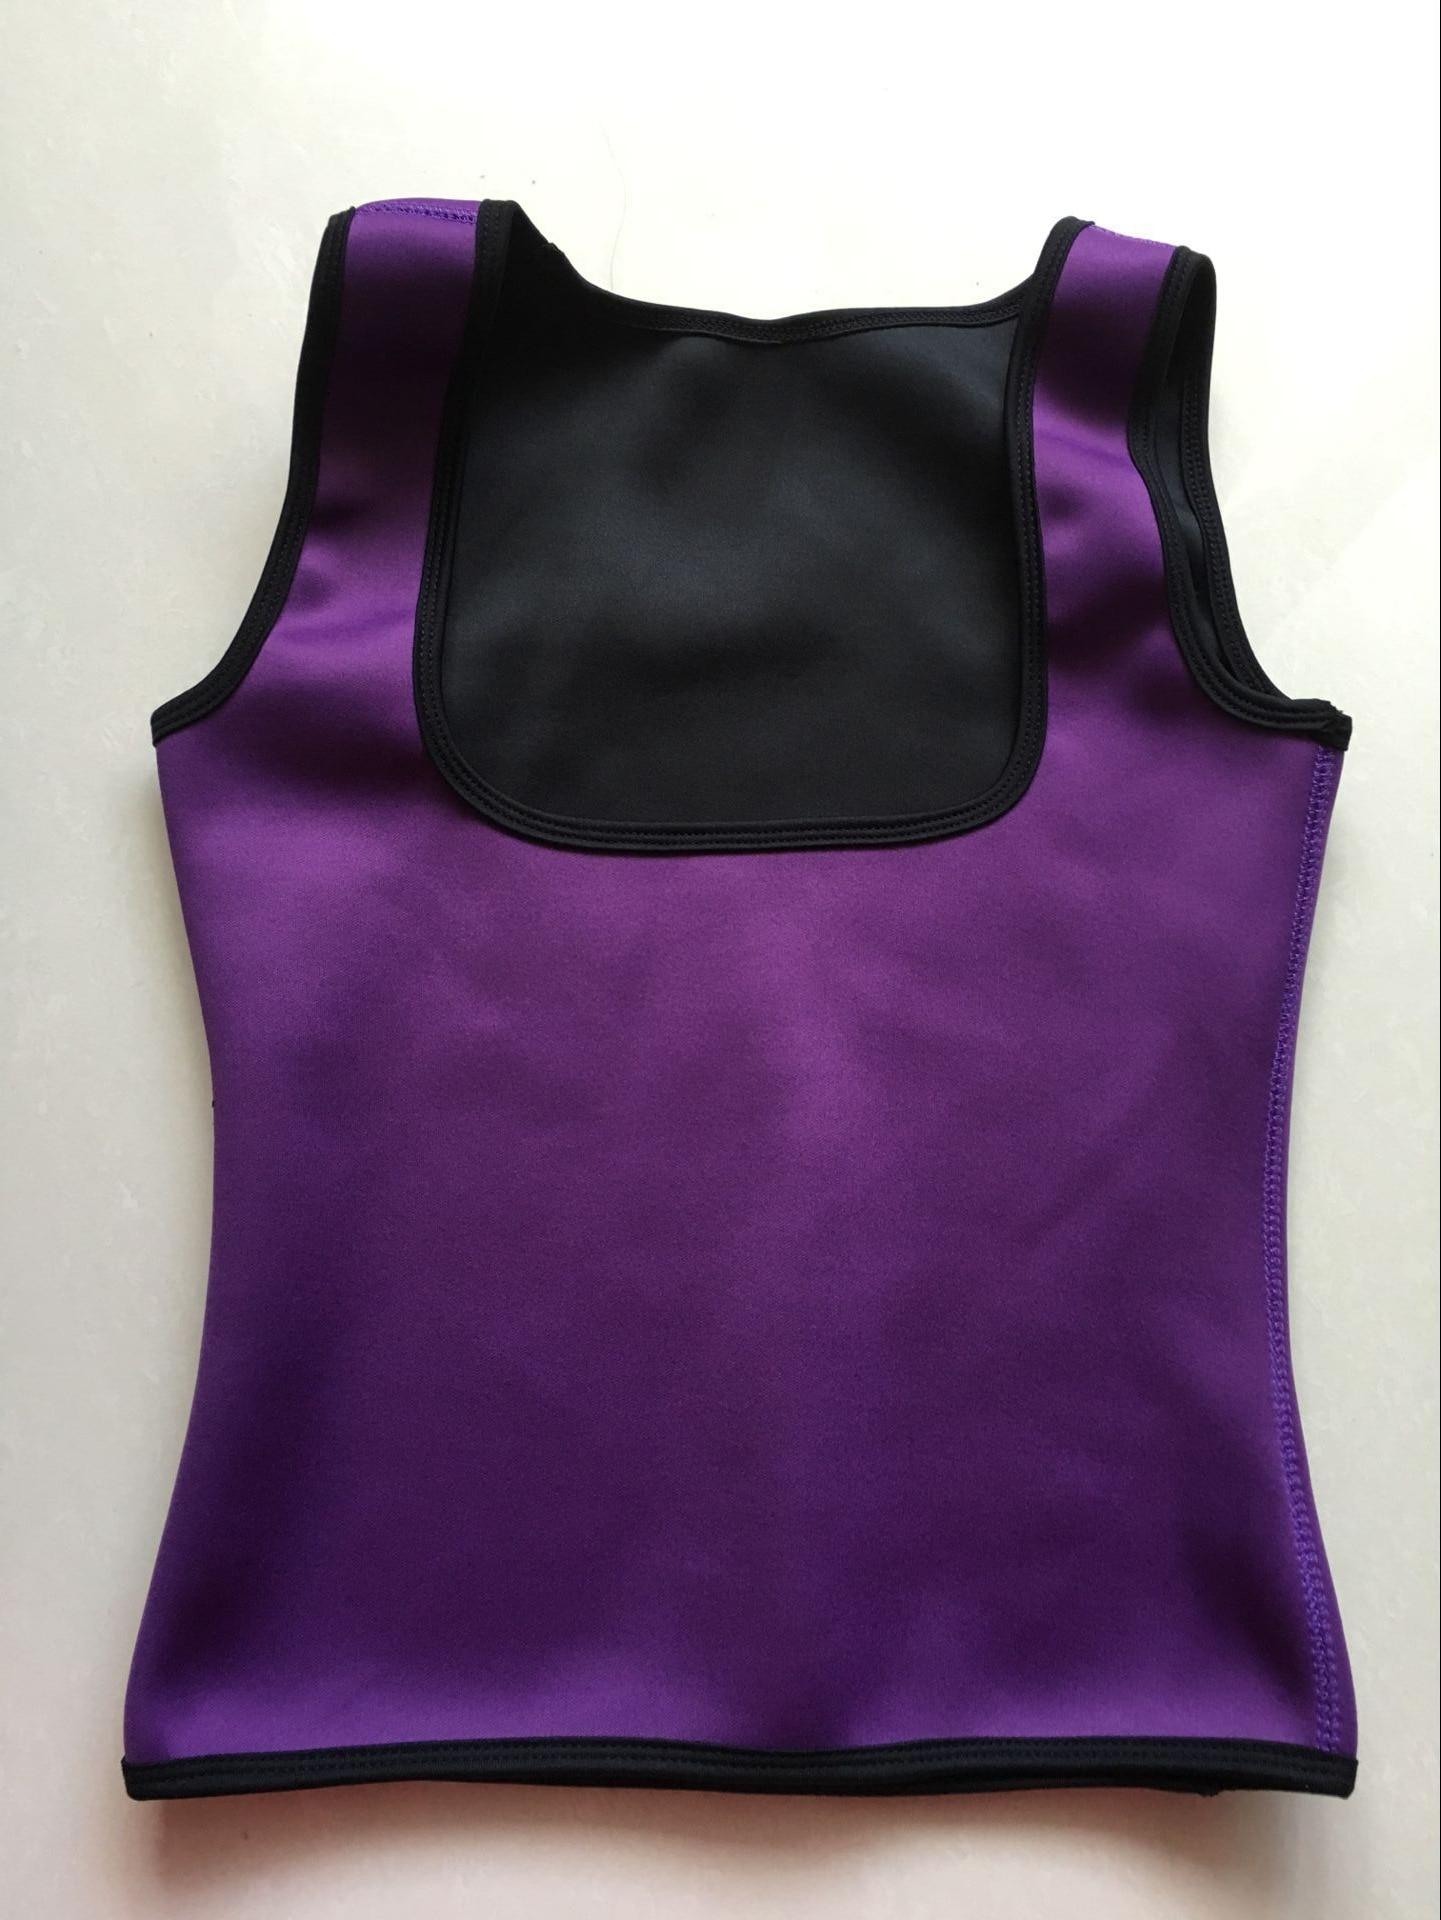 Women shapewear Push Up Vest Slimming Belt Waist Trainer Tummy Belly Girdle Slimming Weight Loss Waist Trainer Face Lift 5